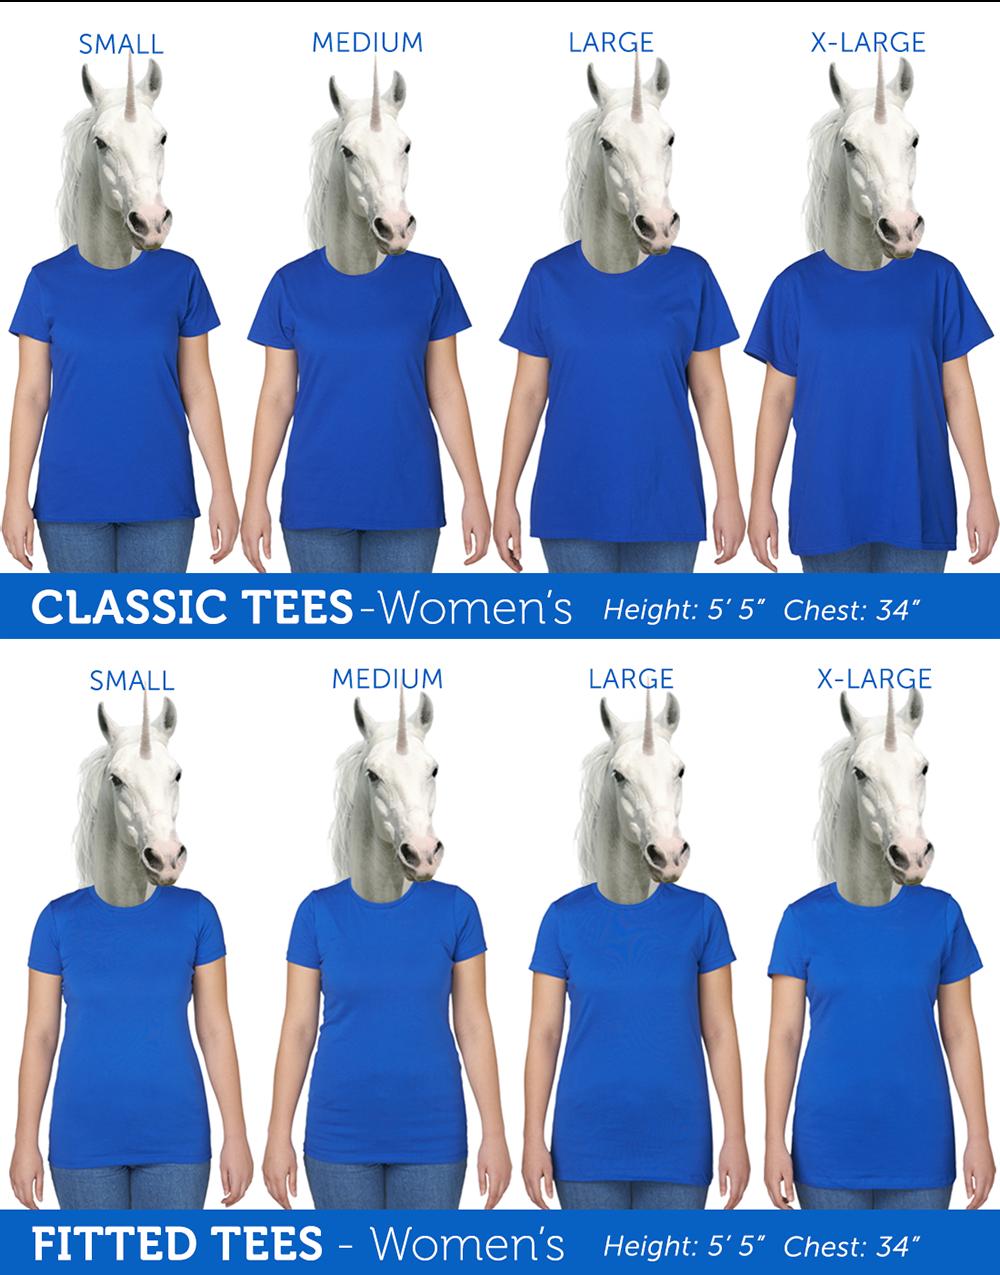 Women's Small-XL